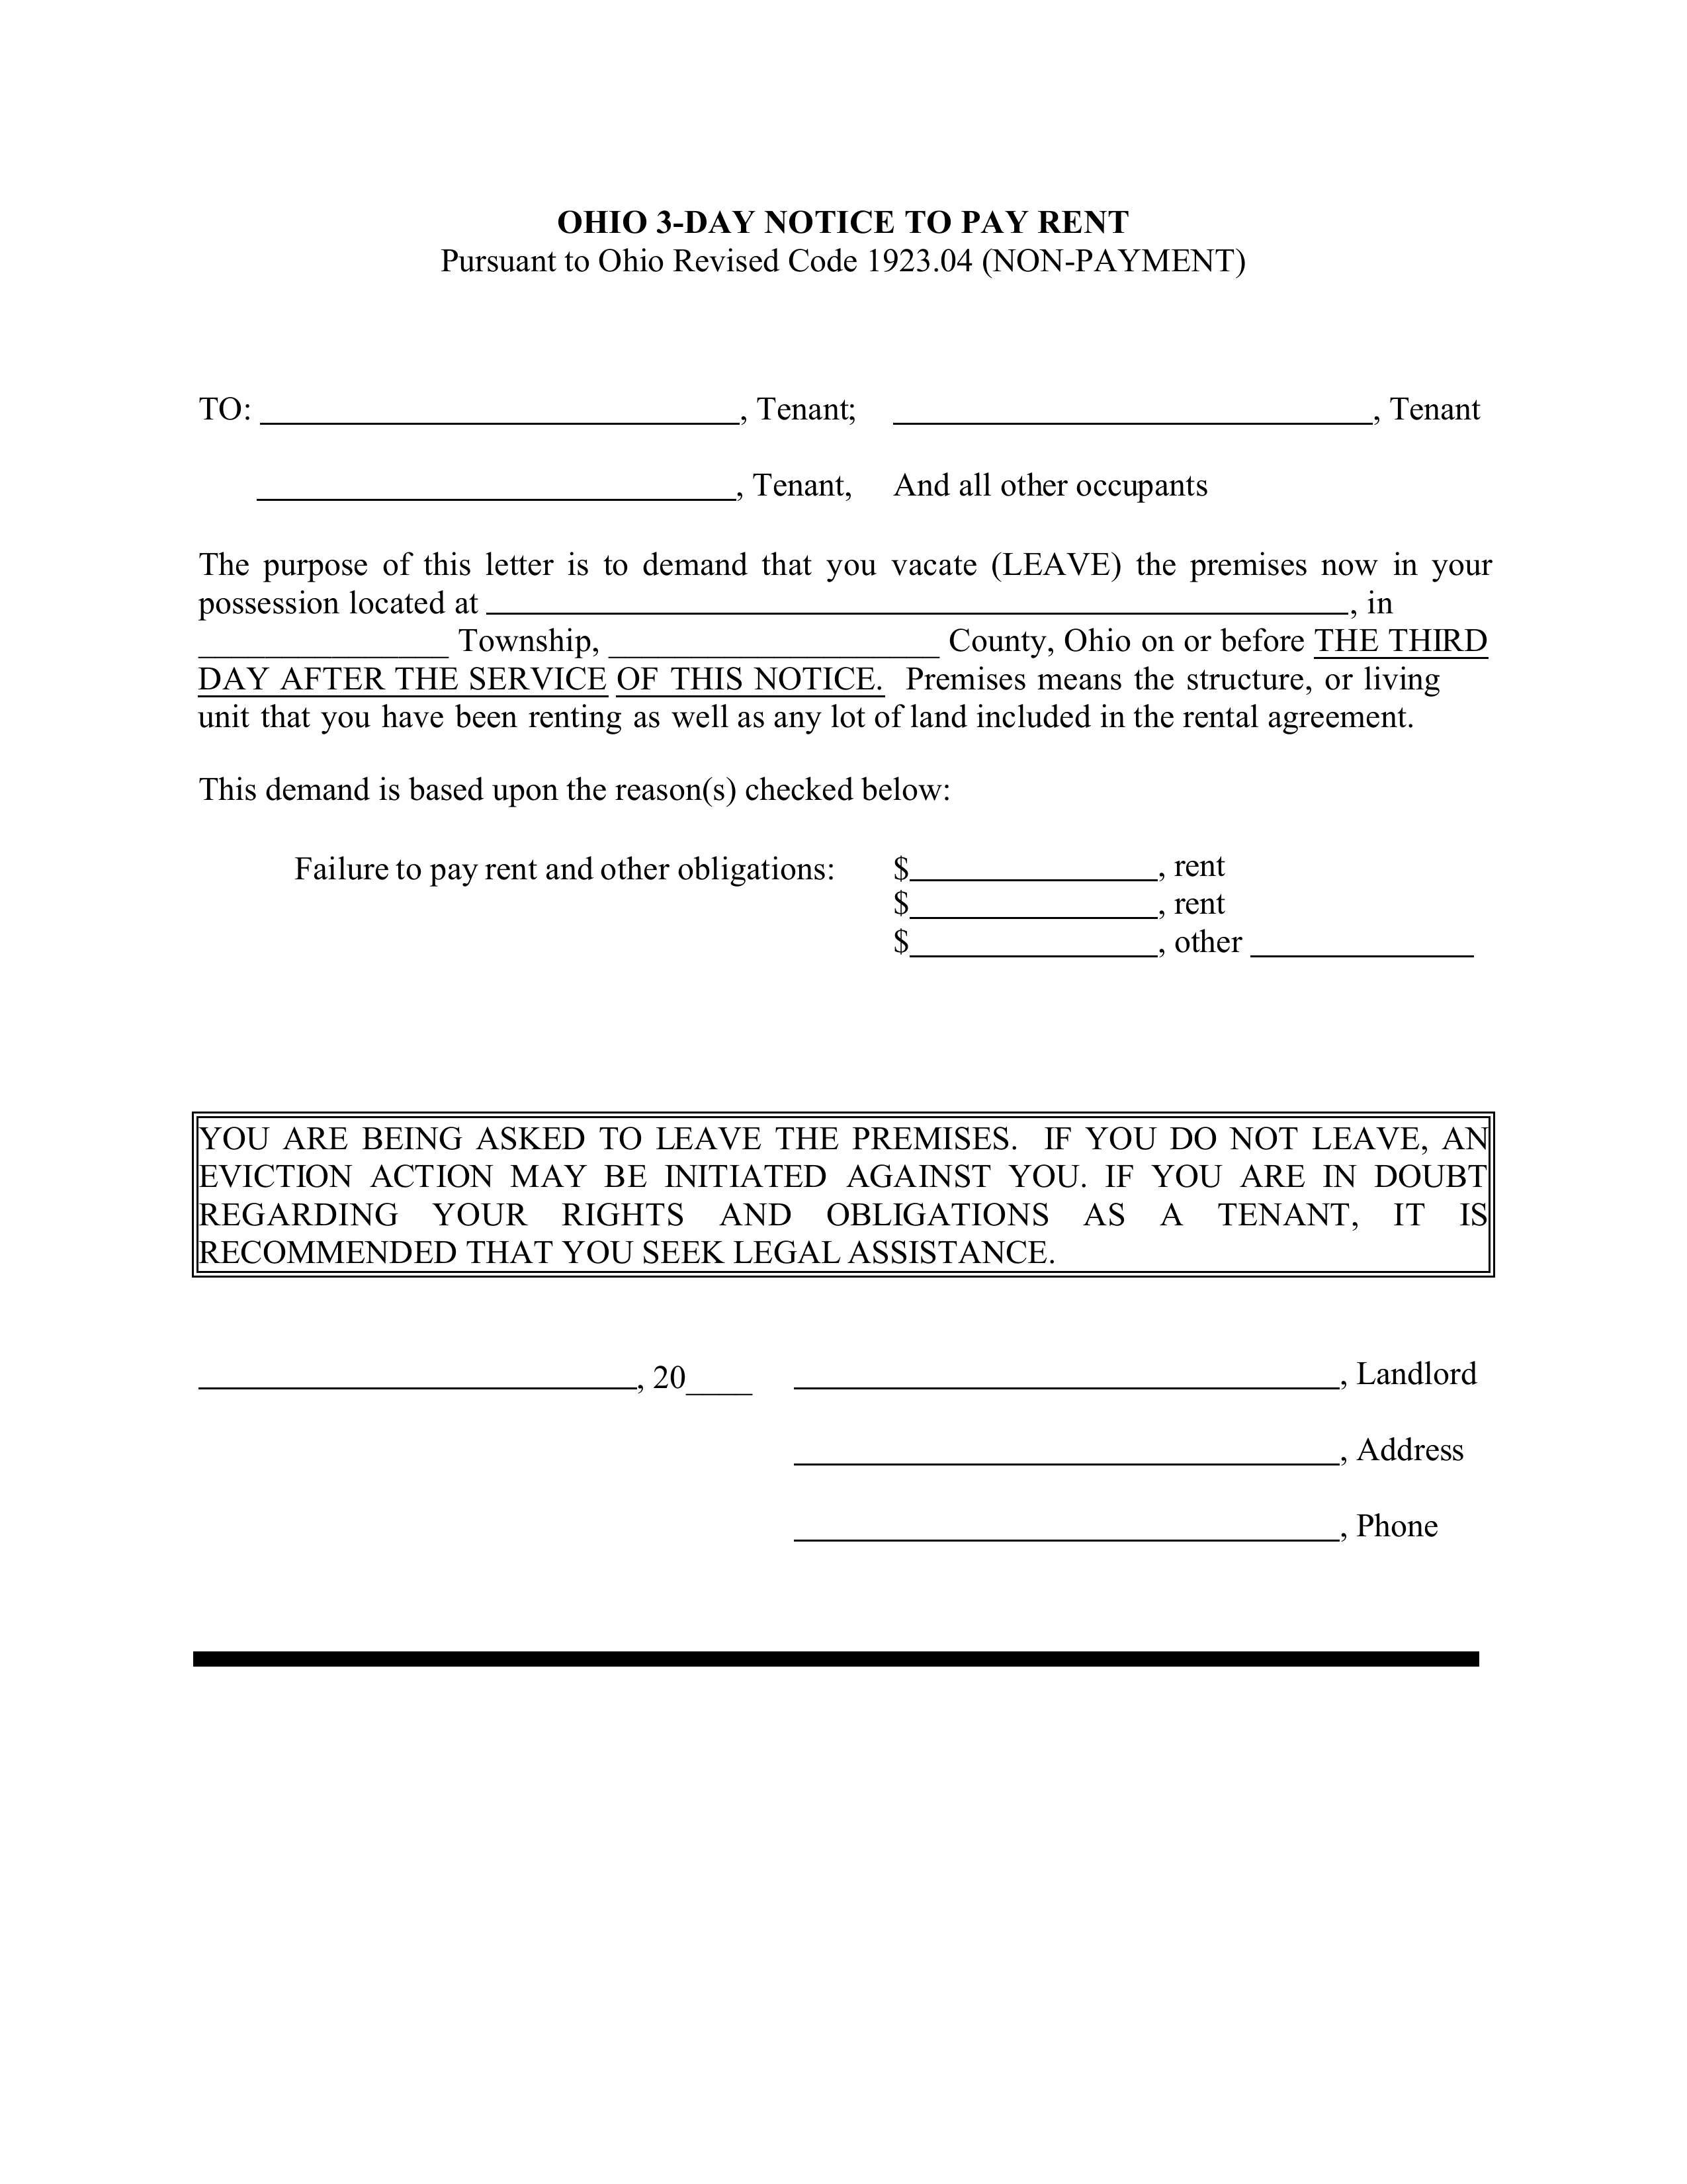 Ohio 3 Day Notice To Quit Form Non